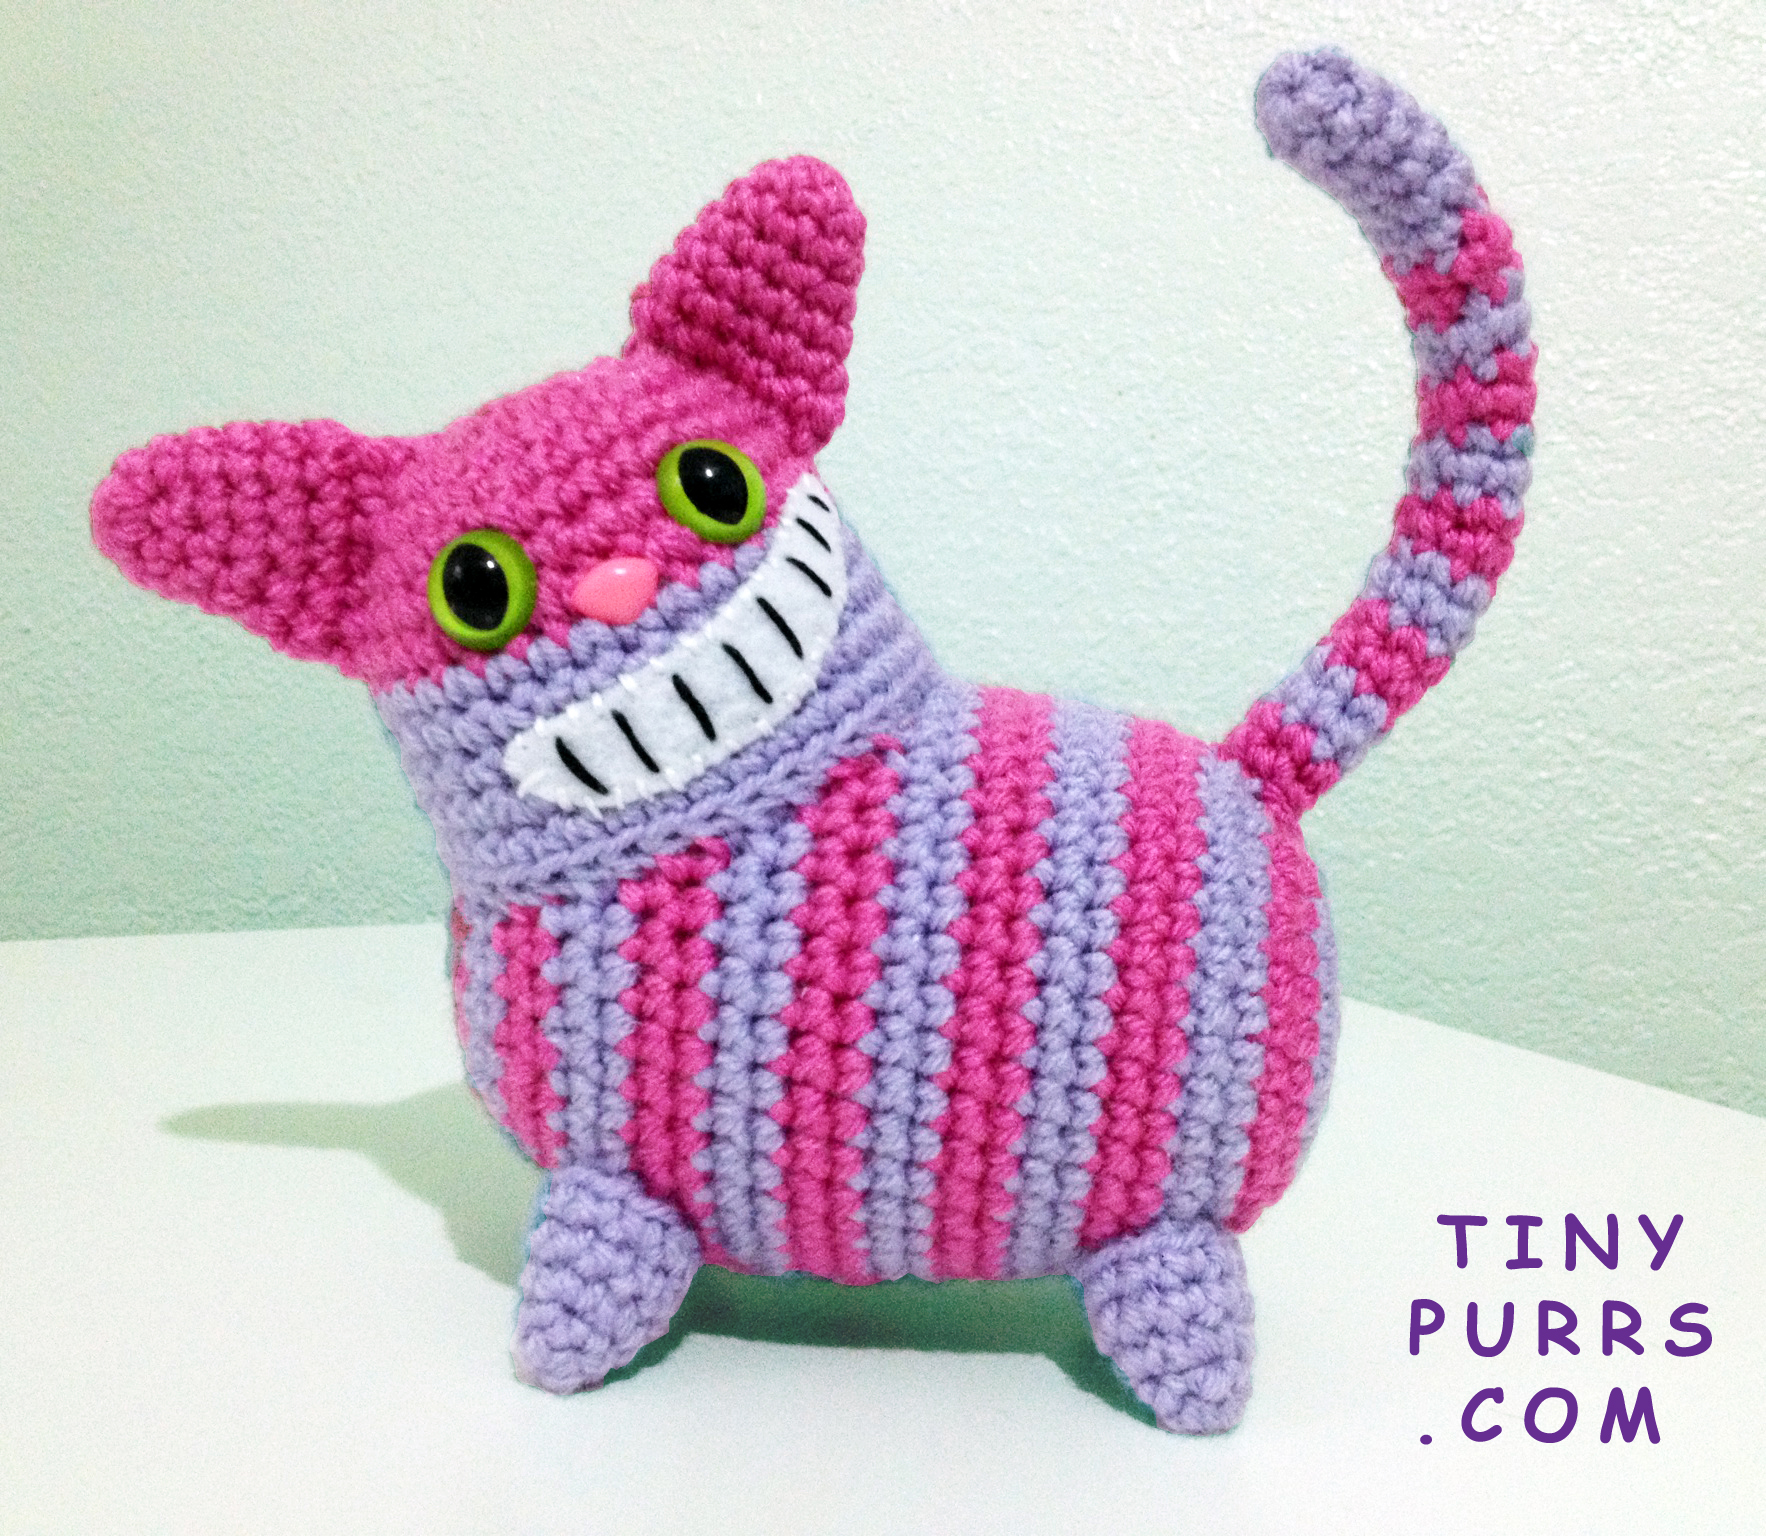 Free Japanese Amigurumi Crochet Patterns : amigurumi Tiny Purrs